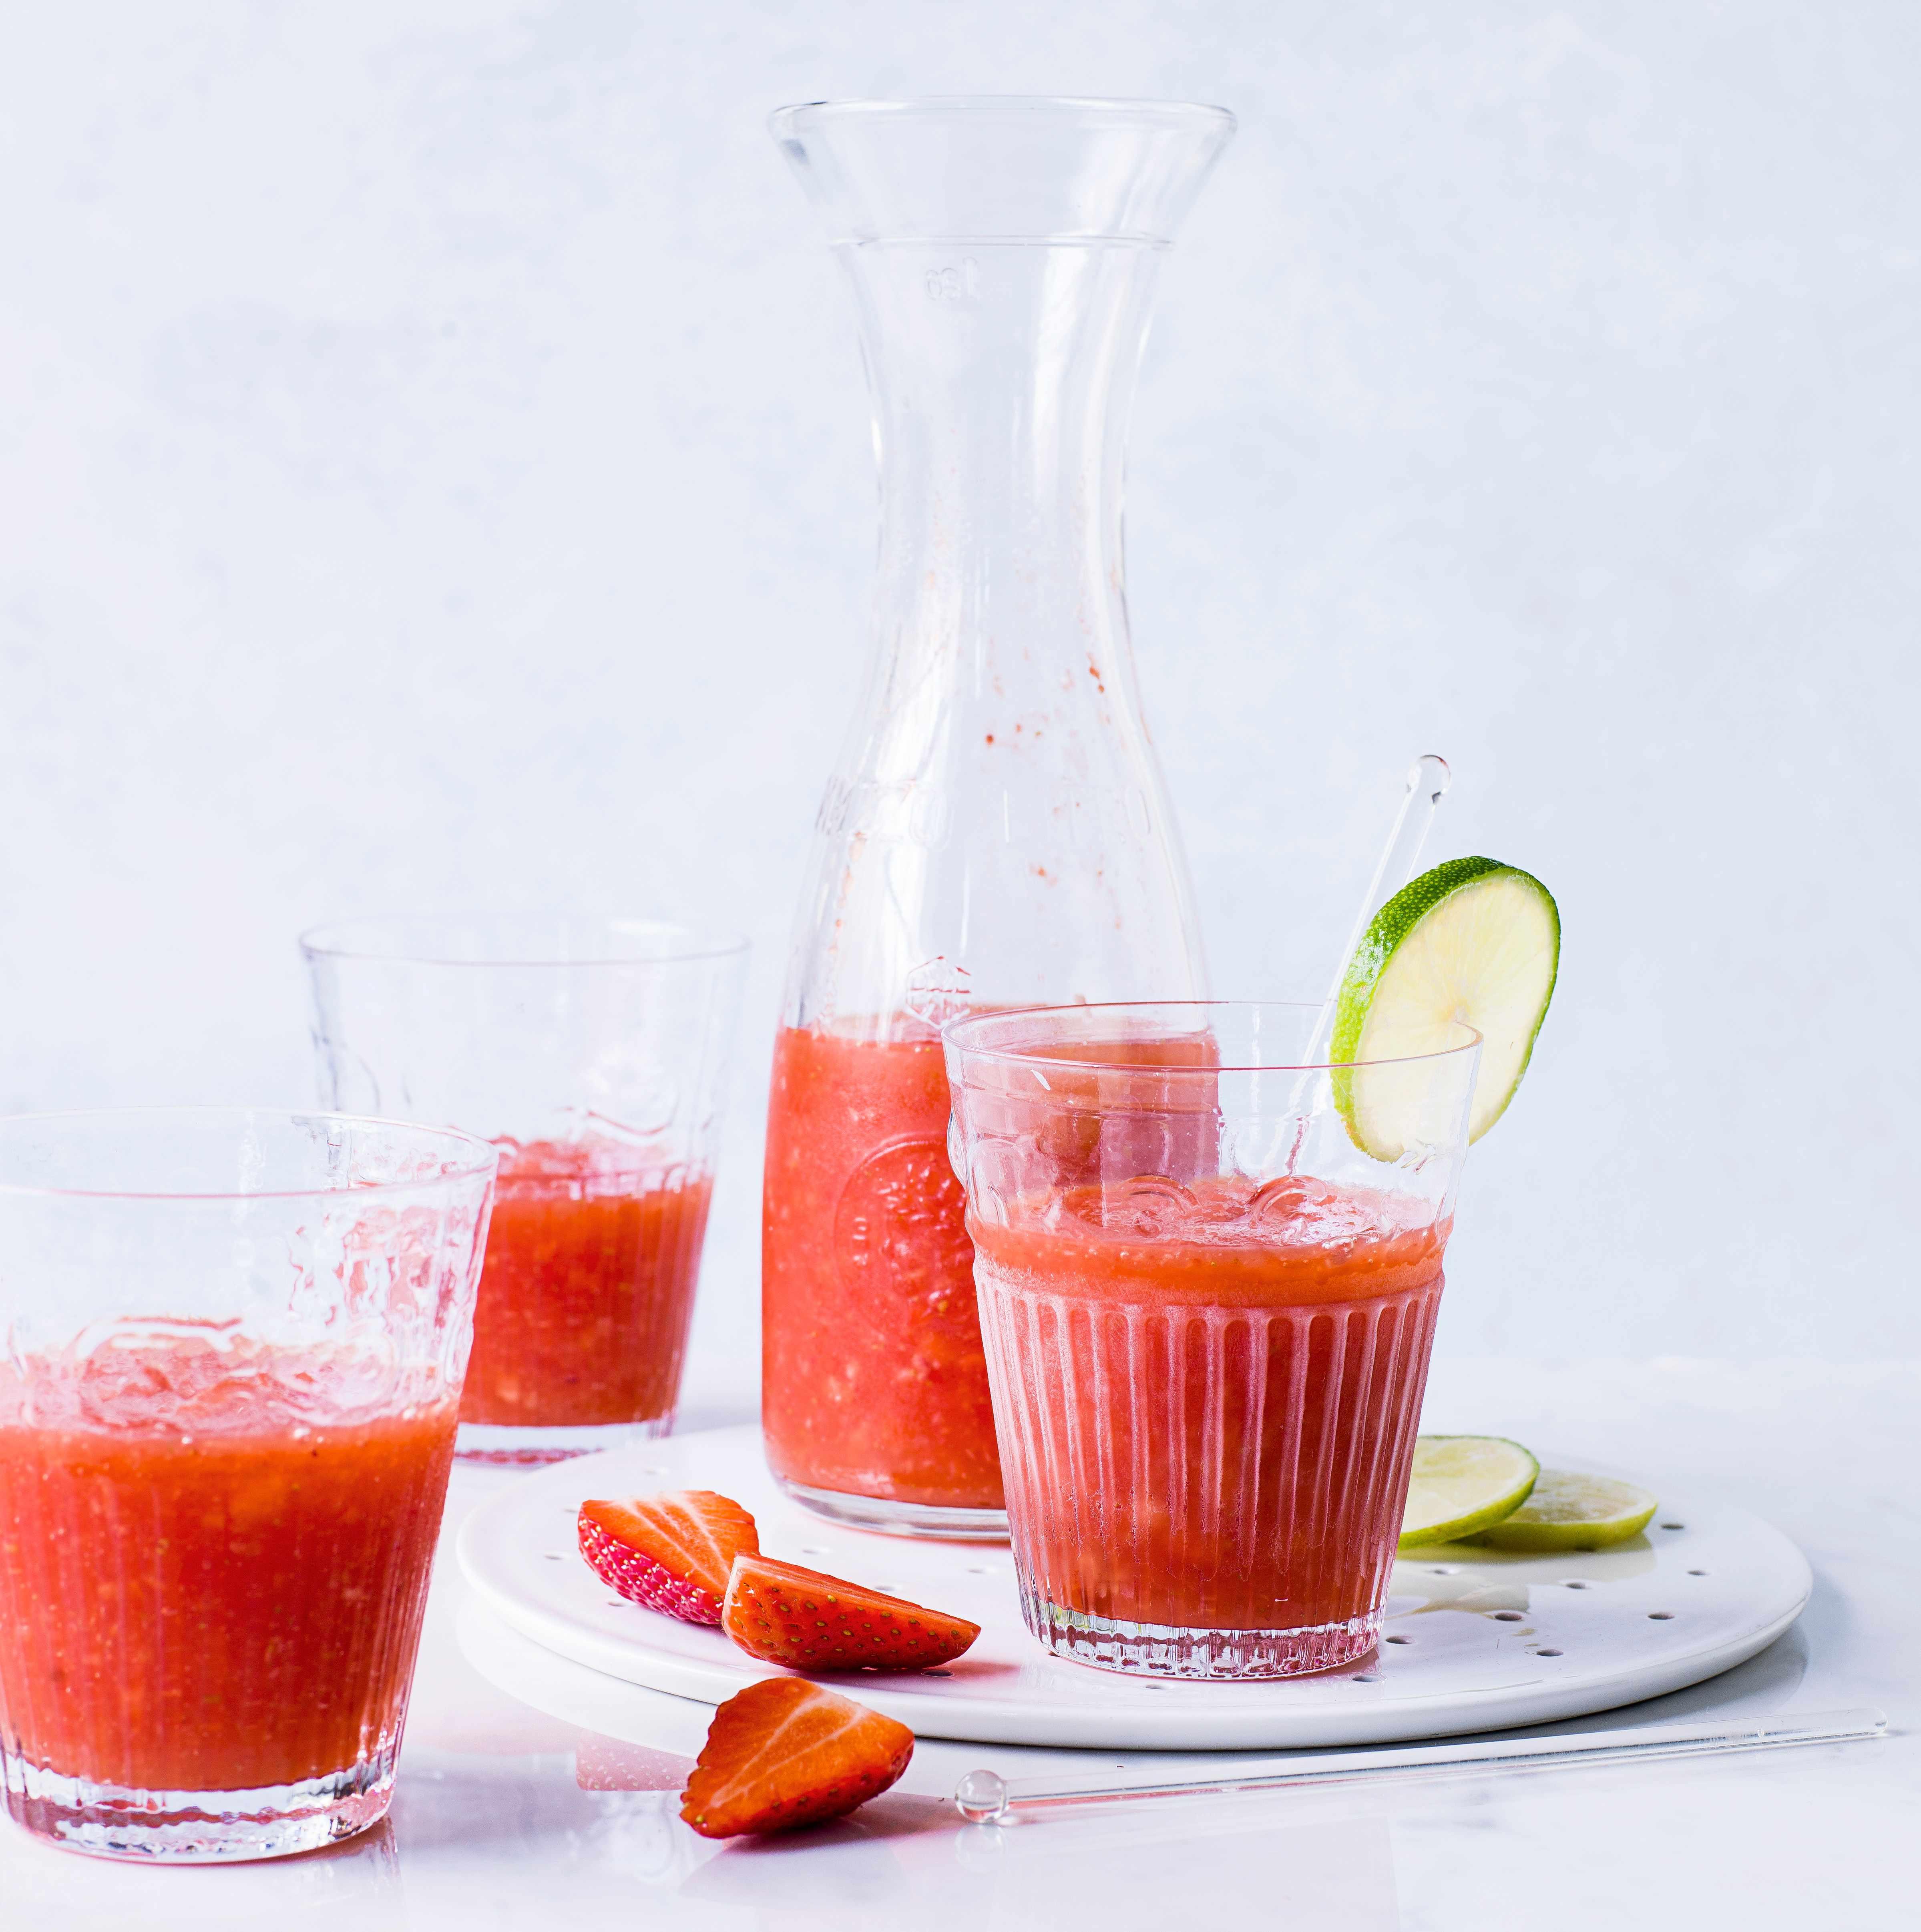 Strawberry margarita slushies